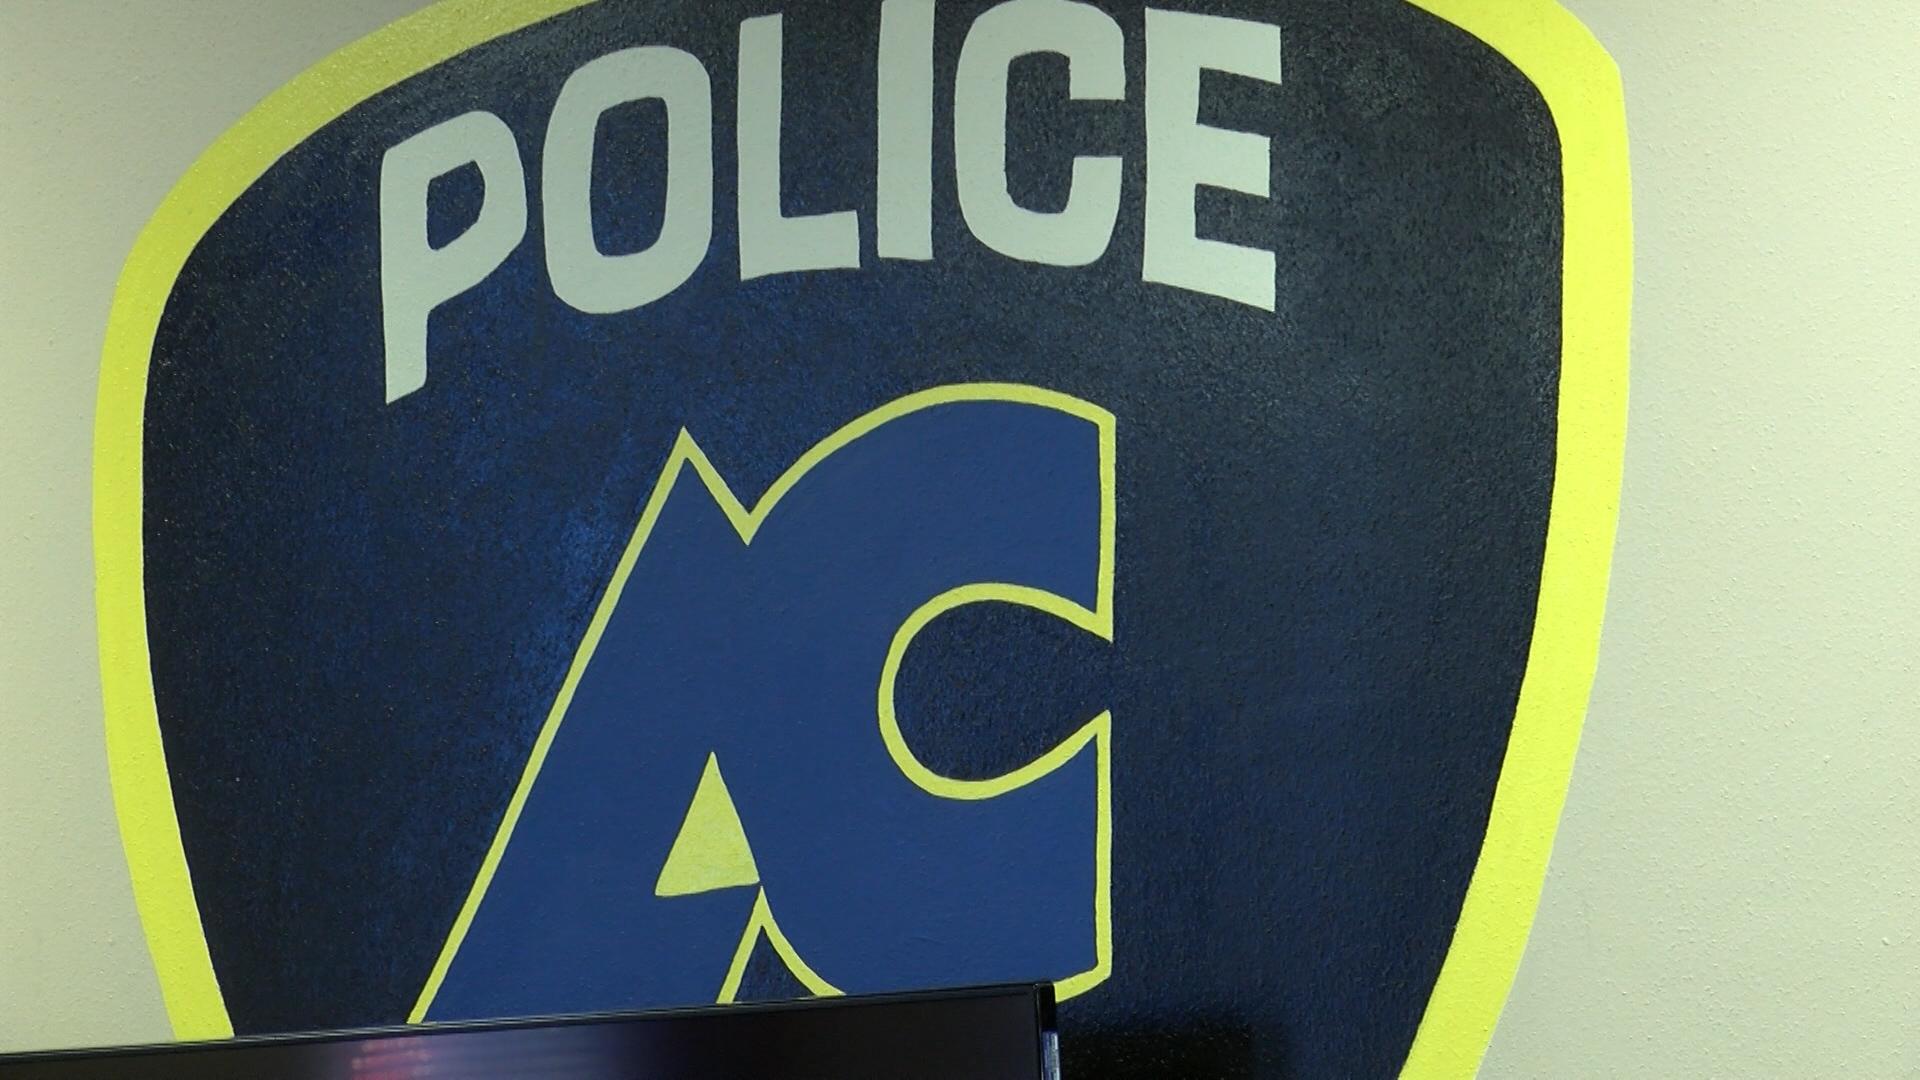 AC POLICE_1516127812817.jpg.jpg